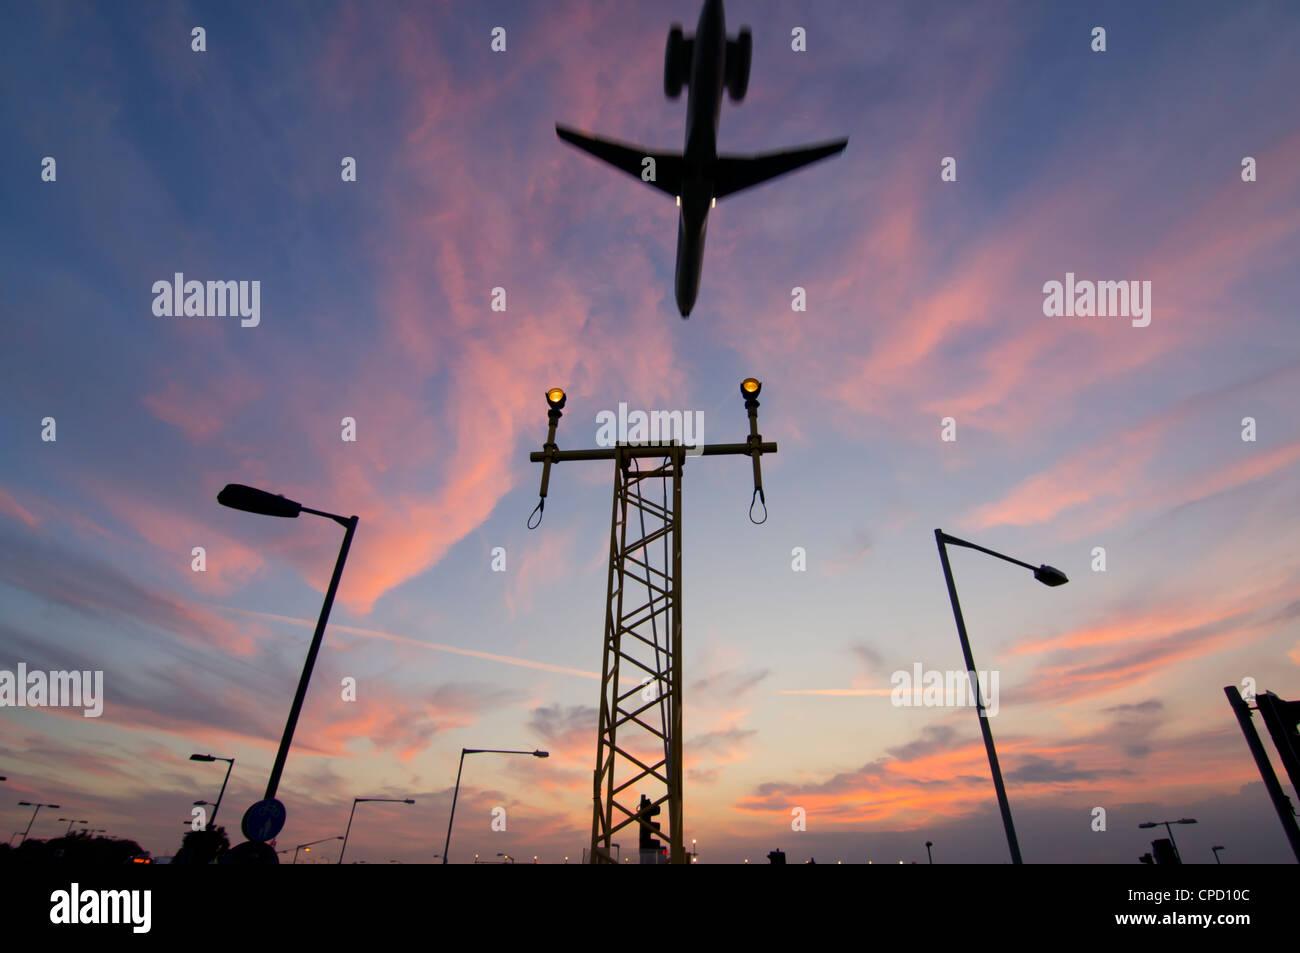 DC9 aircraft approaching over runway landing light gantries at sunset, London, England, United Kingdom, Europe - Stock Image